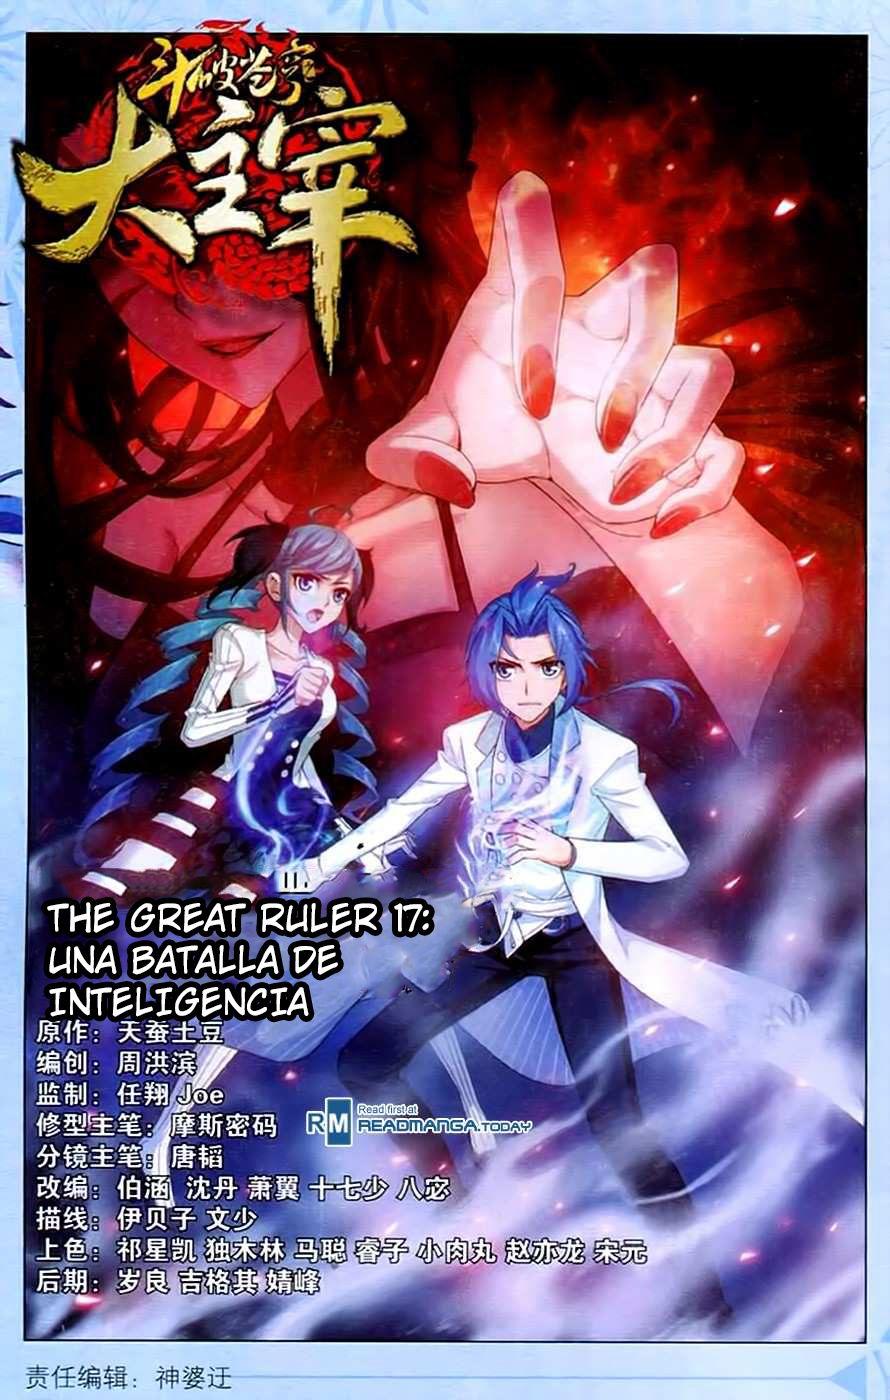 http://c5.ninemanga.com/es_manga/26/16346/457755/65546ed1aea0d4a89d6aa035968c2a3d.jpg Page 3